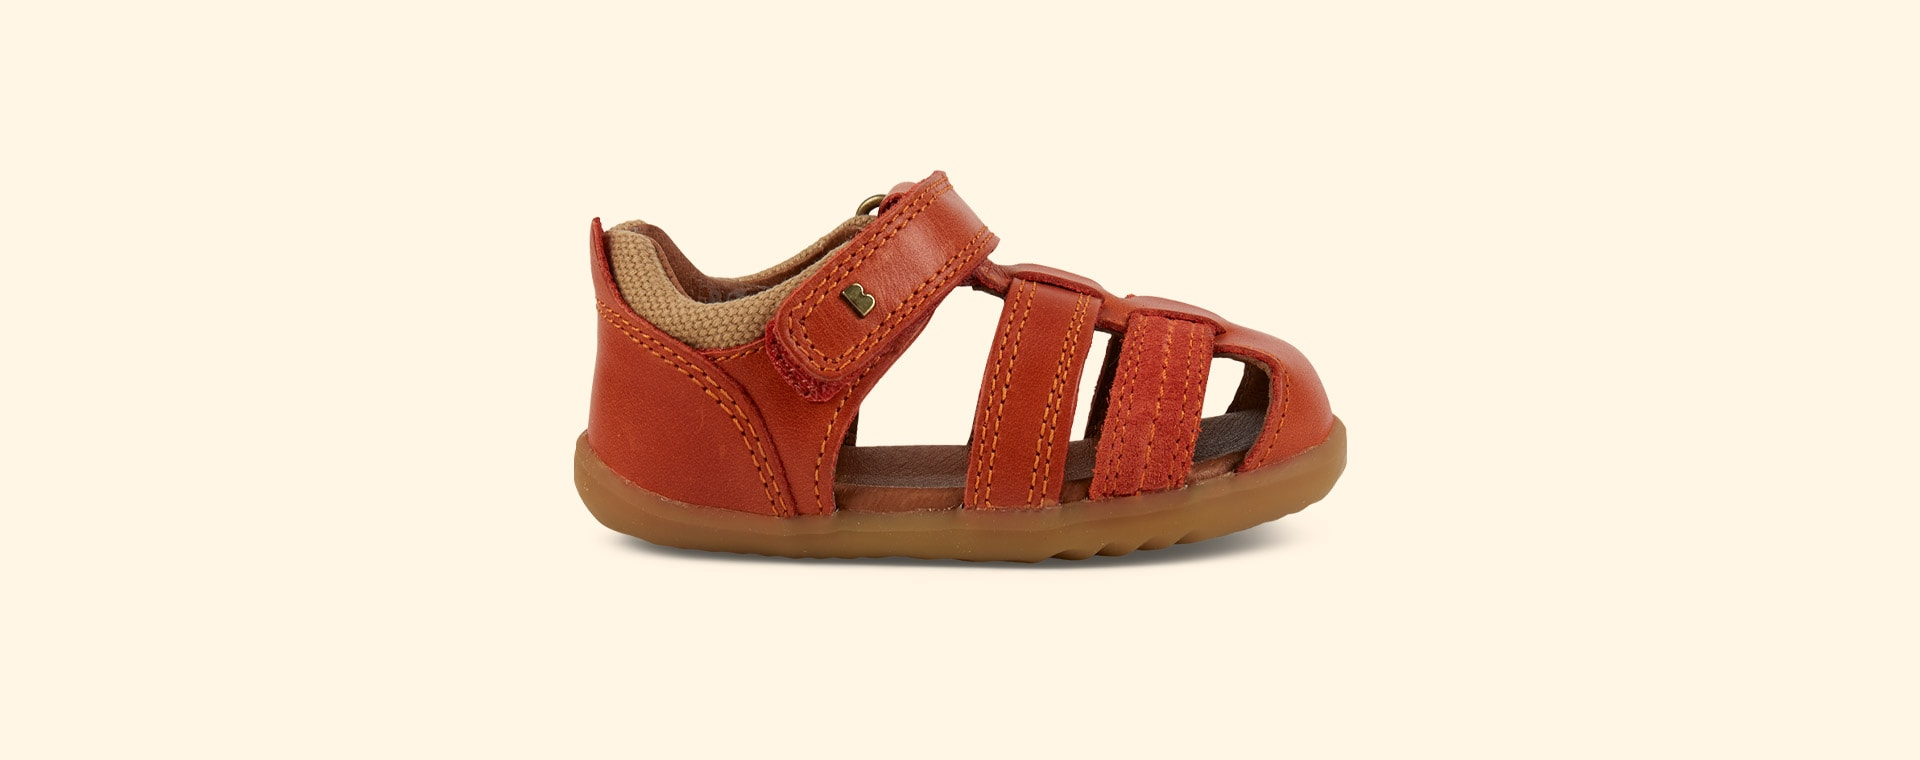 Paprika Bobux Step Up Roam Closed Sandal